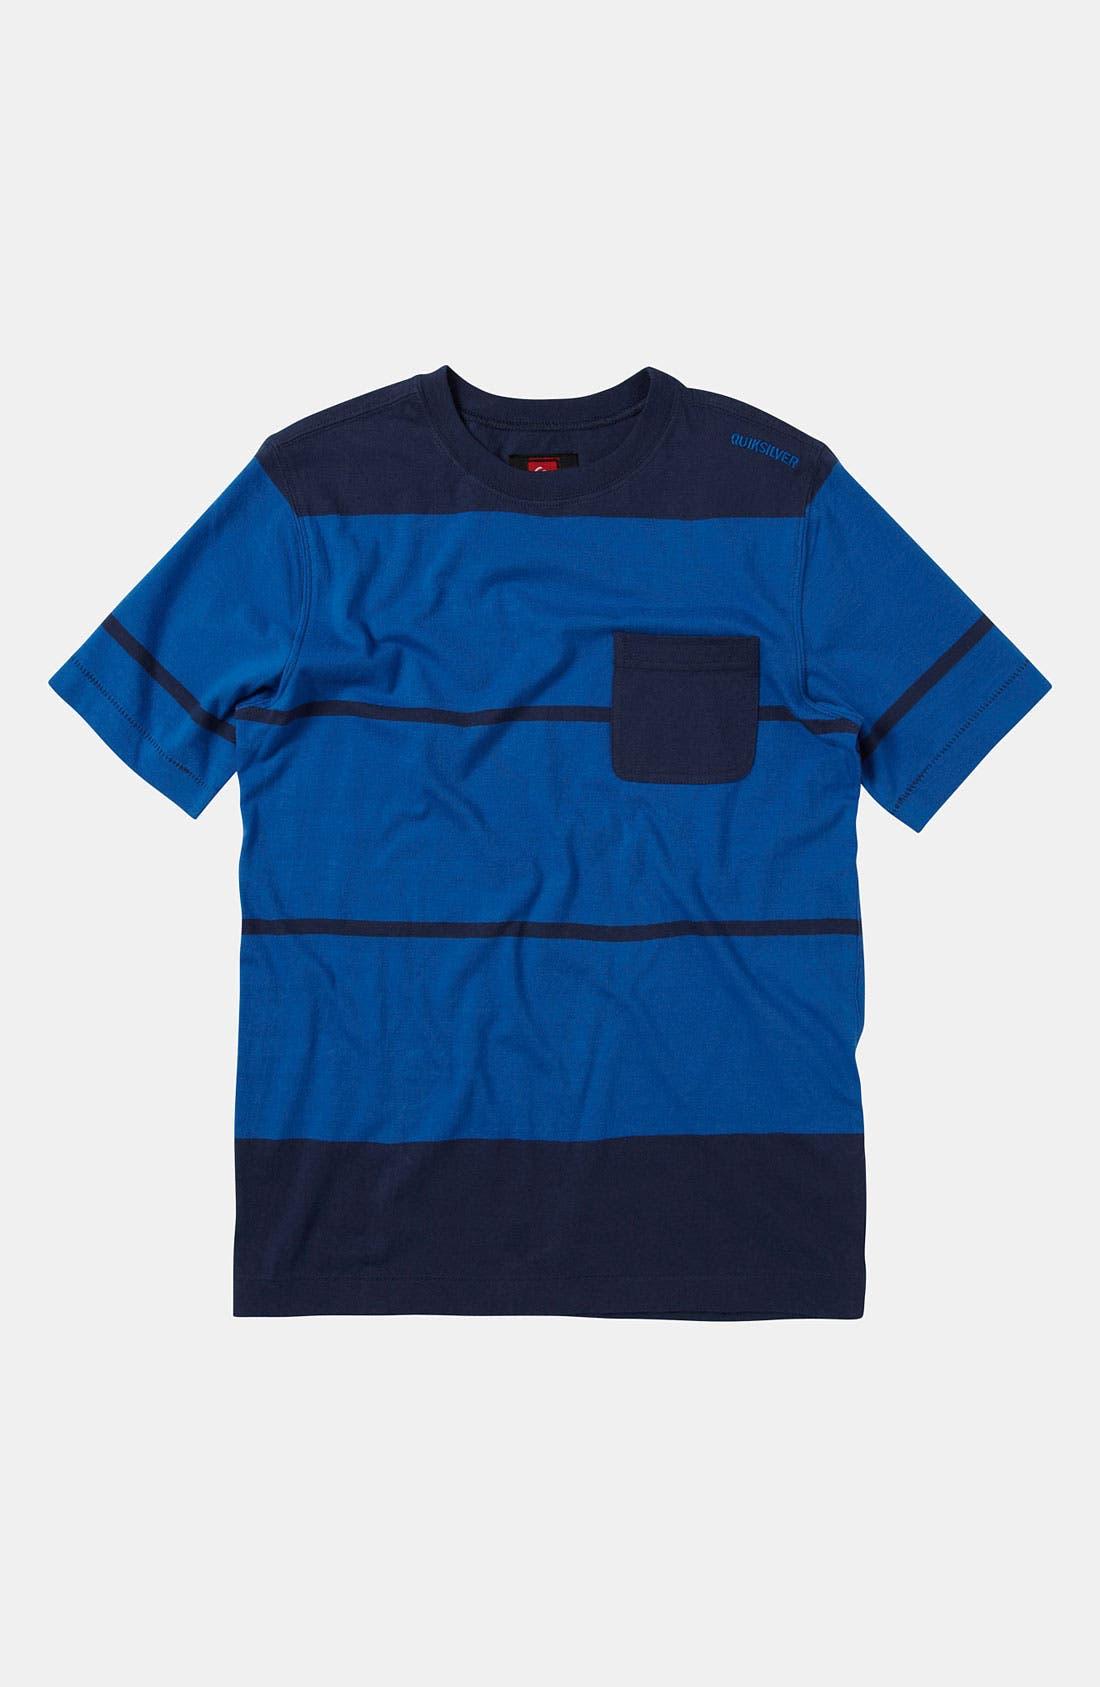 Main Image - Quiksilver 'Tenney' T-Shirt (Big Boys)